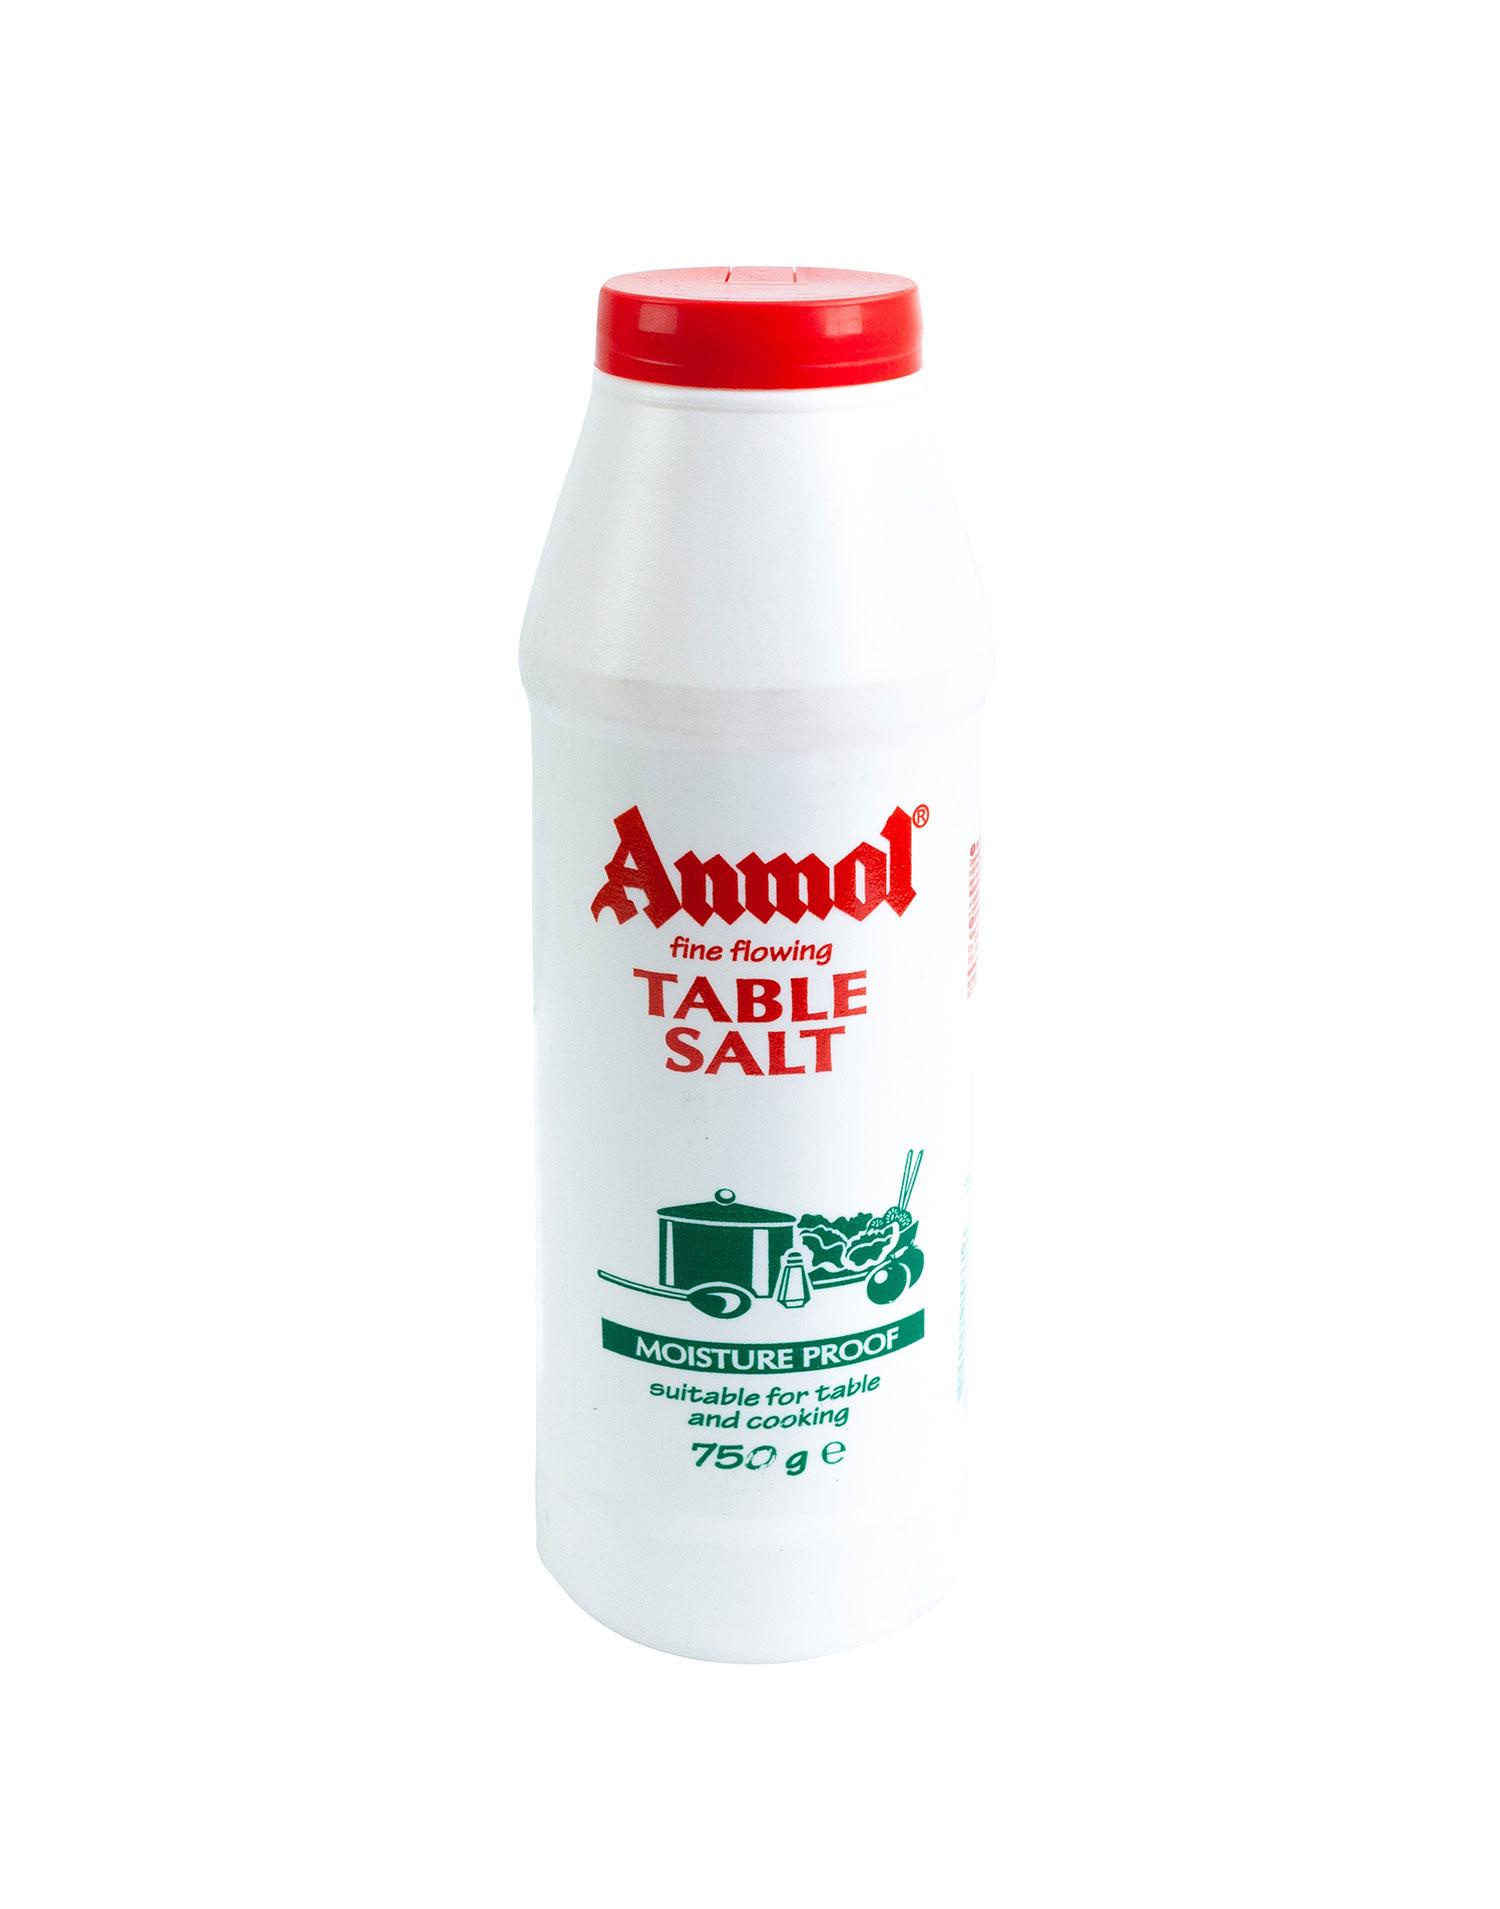 ANMOL TABLE SALT